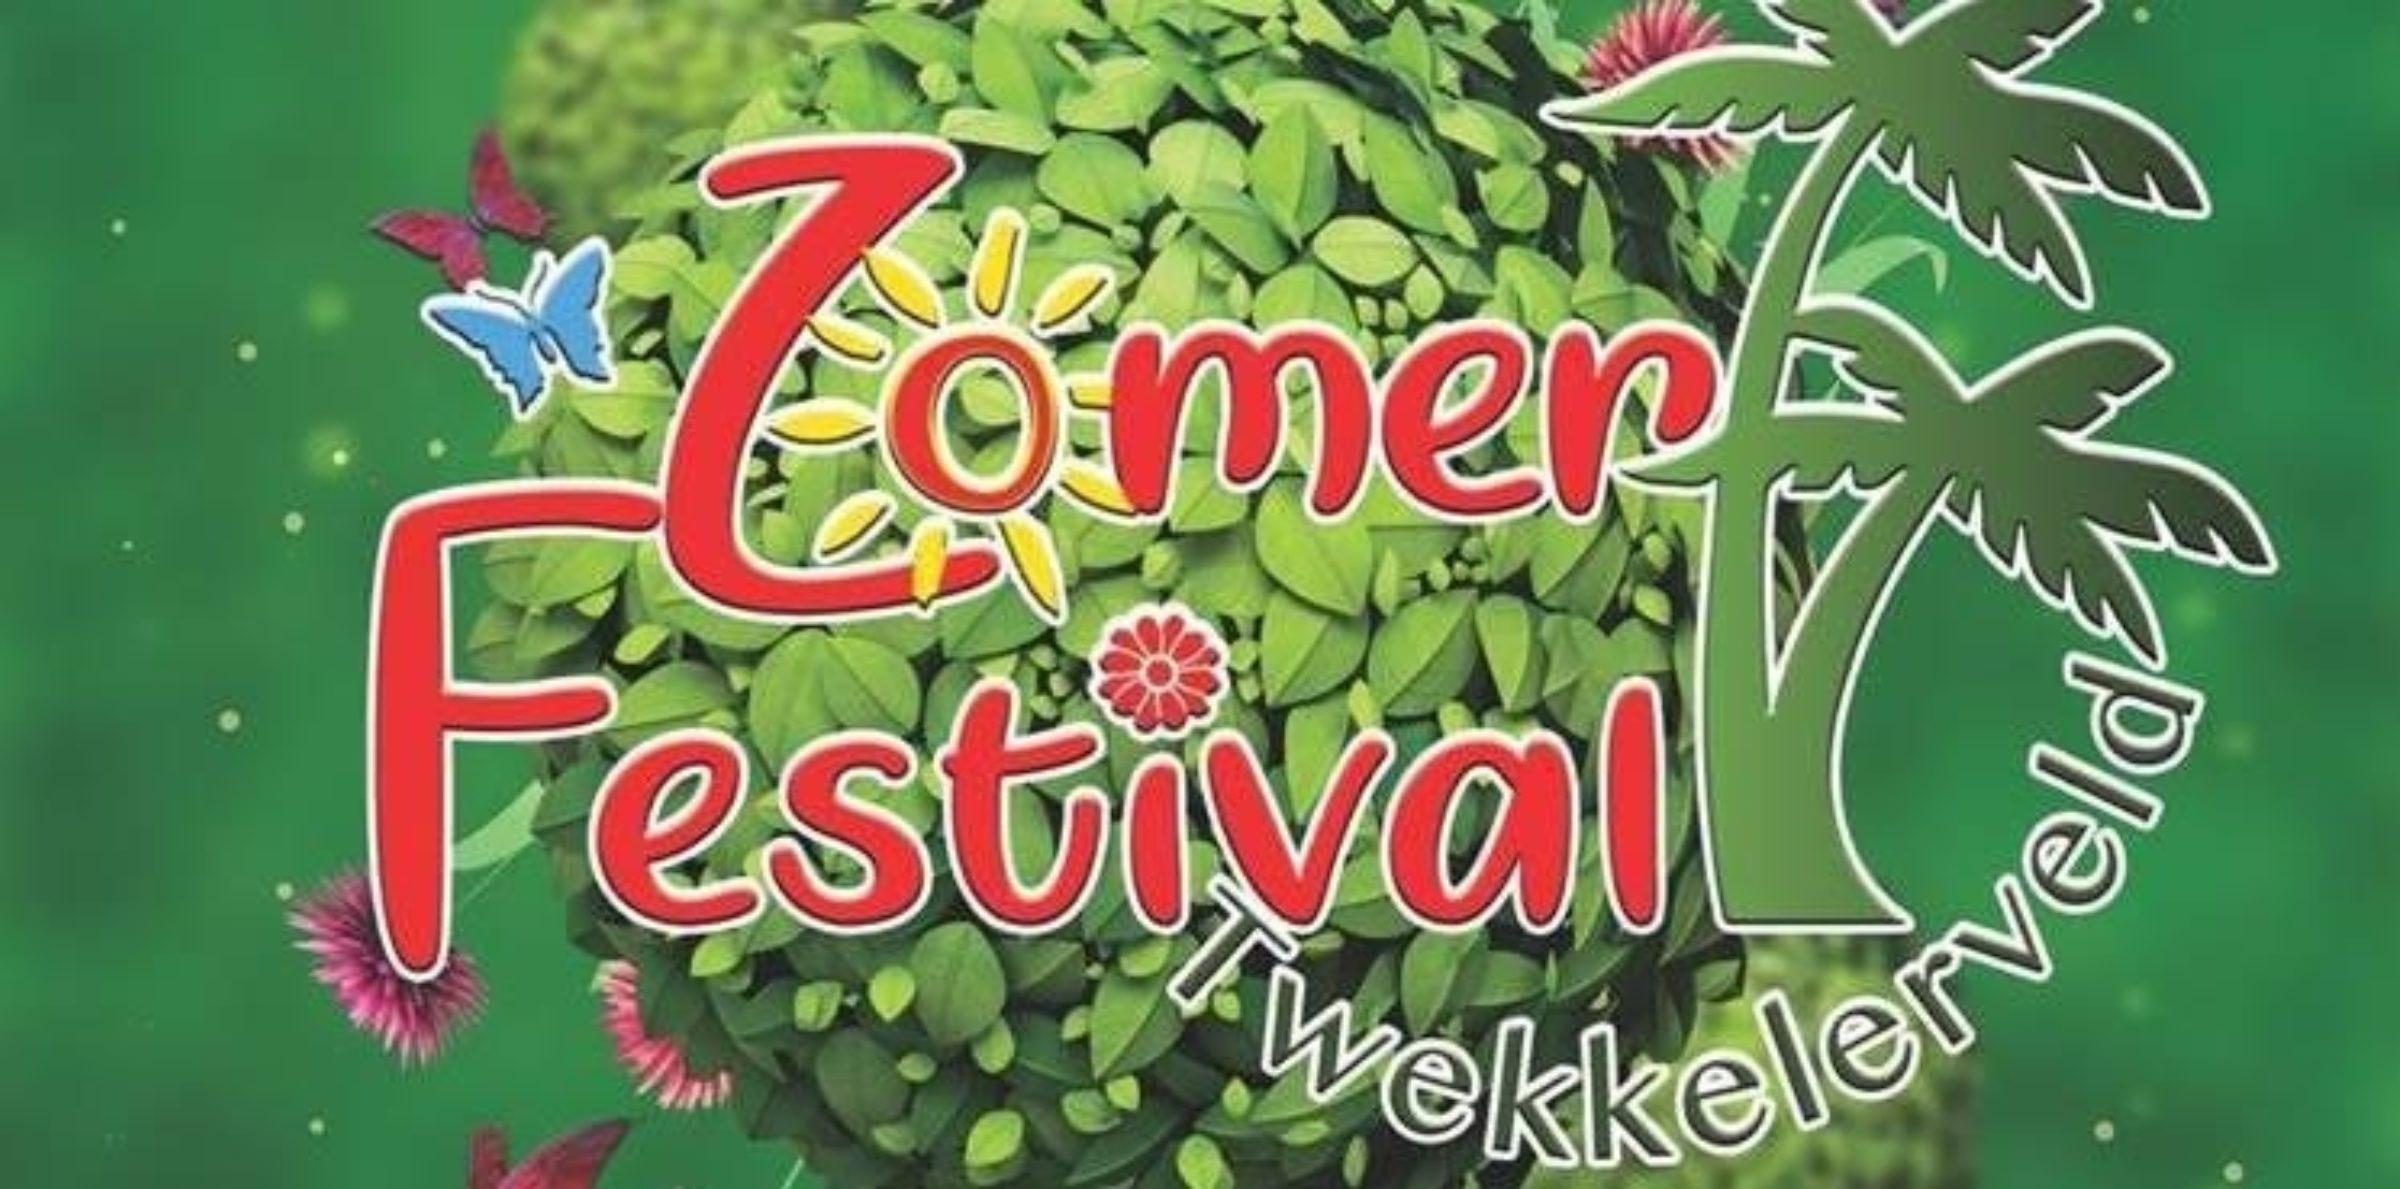 Zomerfestival Twekkelerveld 2530 1553528478 35hxekj7fc